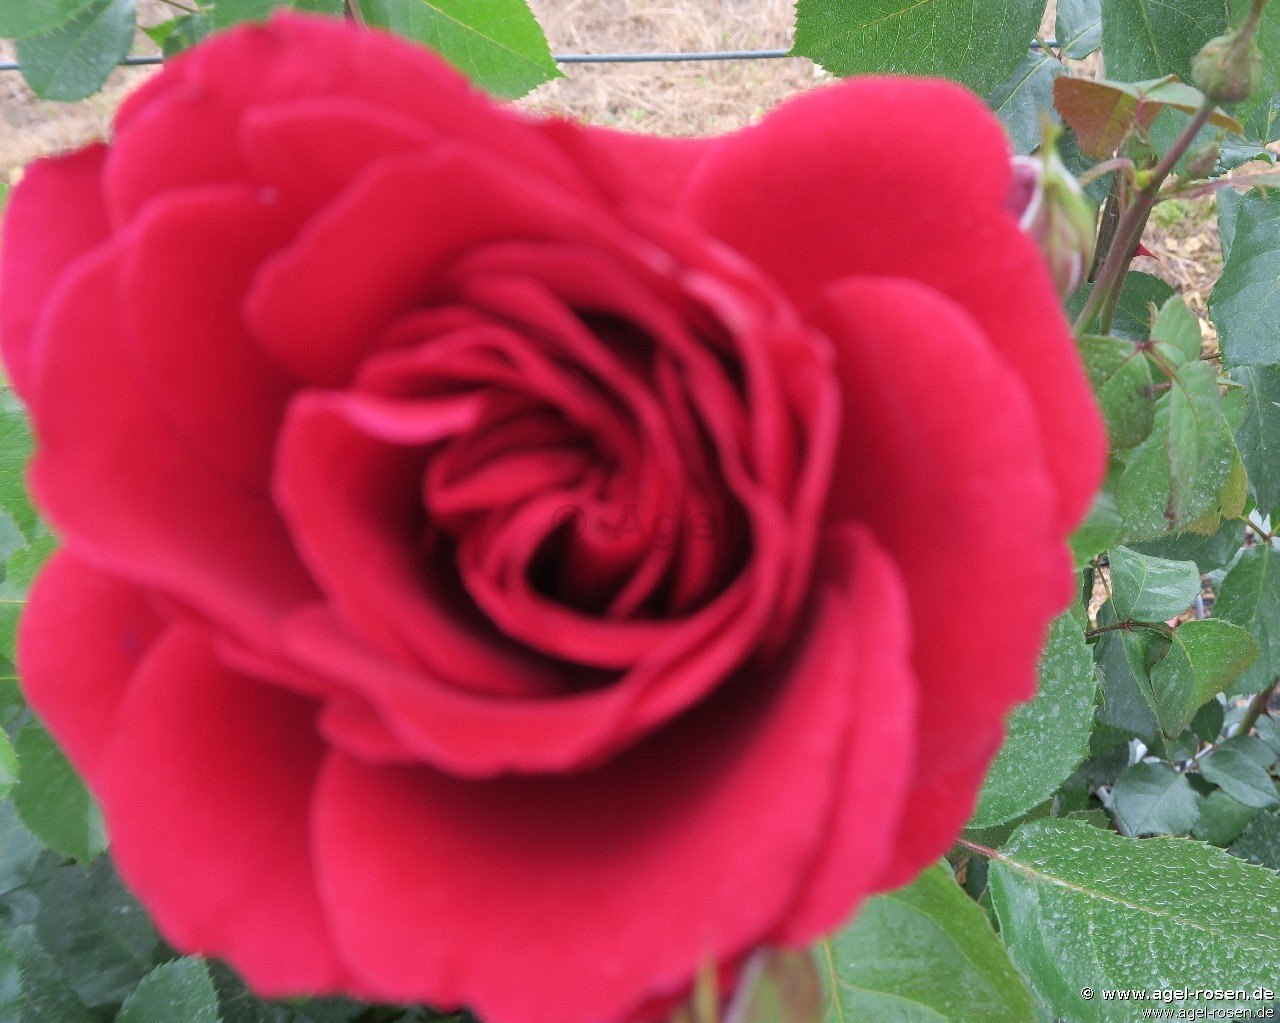 mushimara climbing rose buy at agel rosen. Black Bedroom Furniture Sets. Home Design Ideas